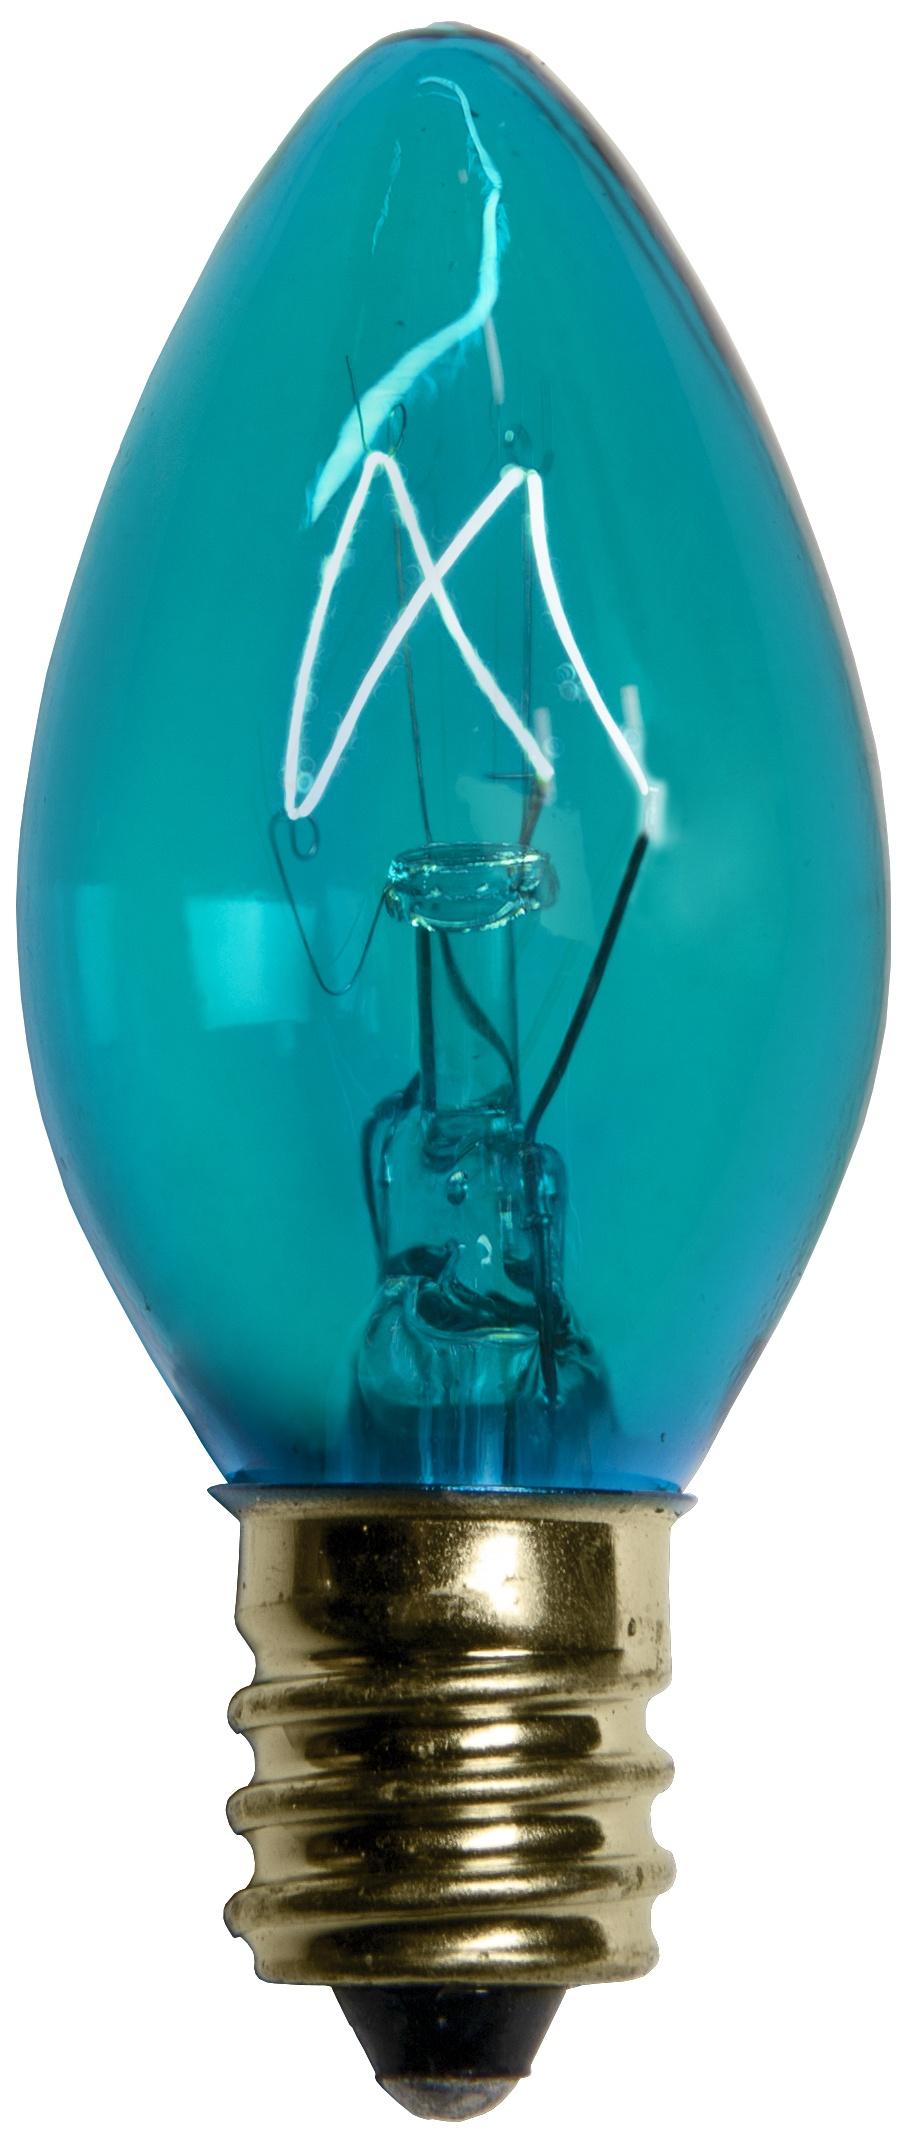 Light Bulb Teal